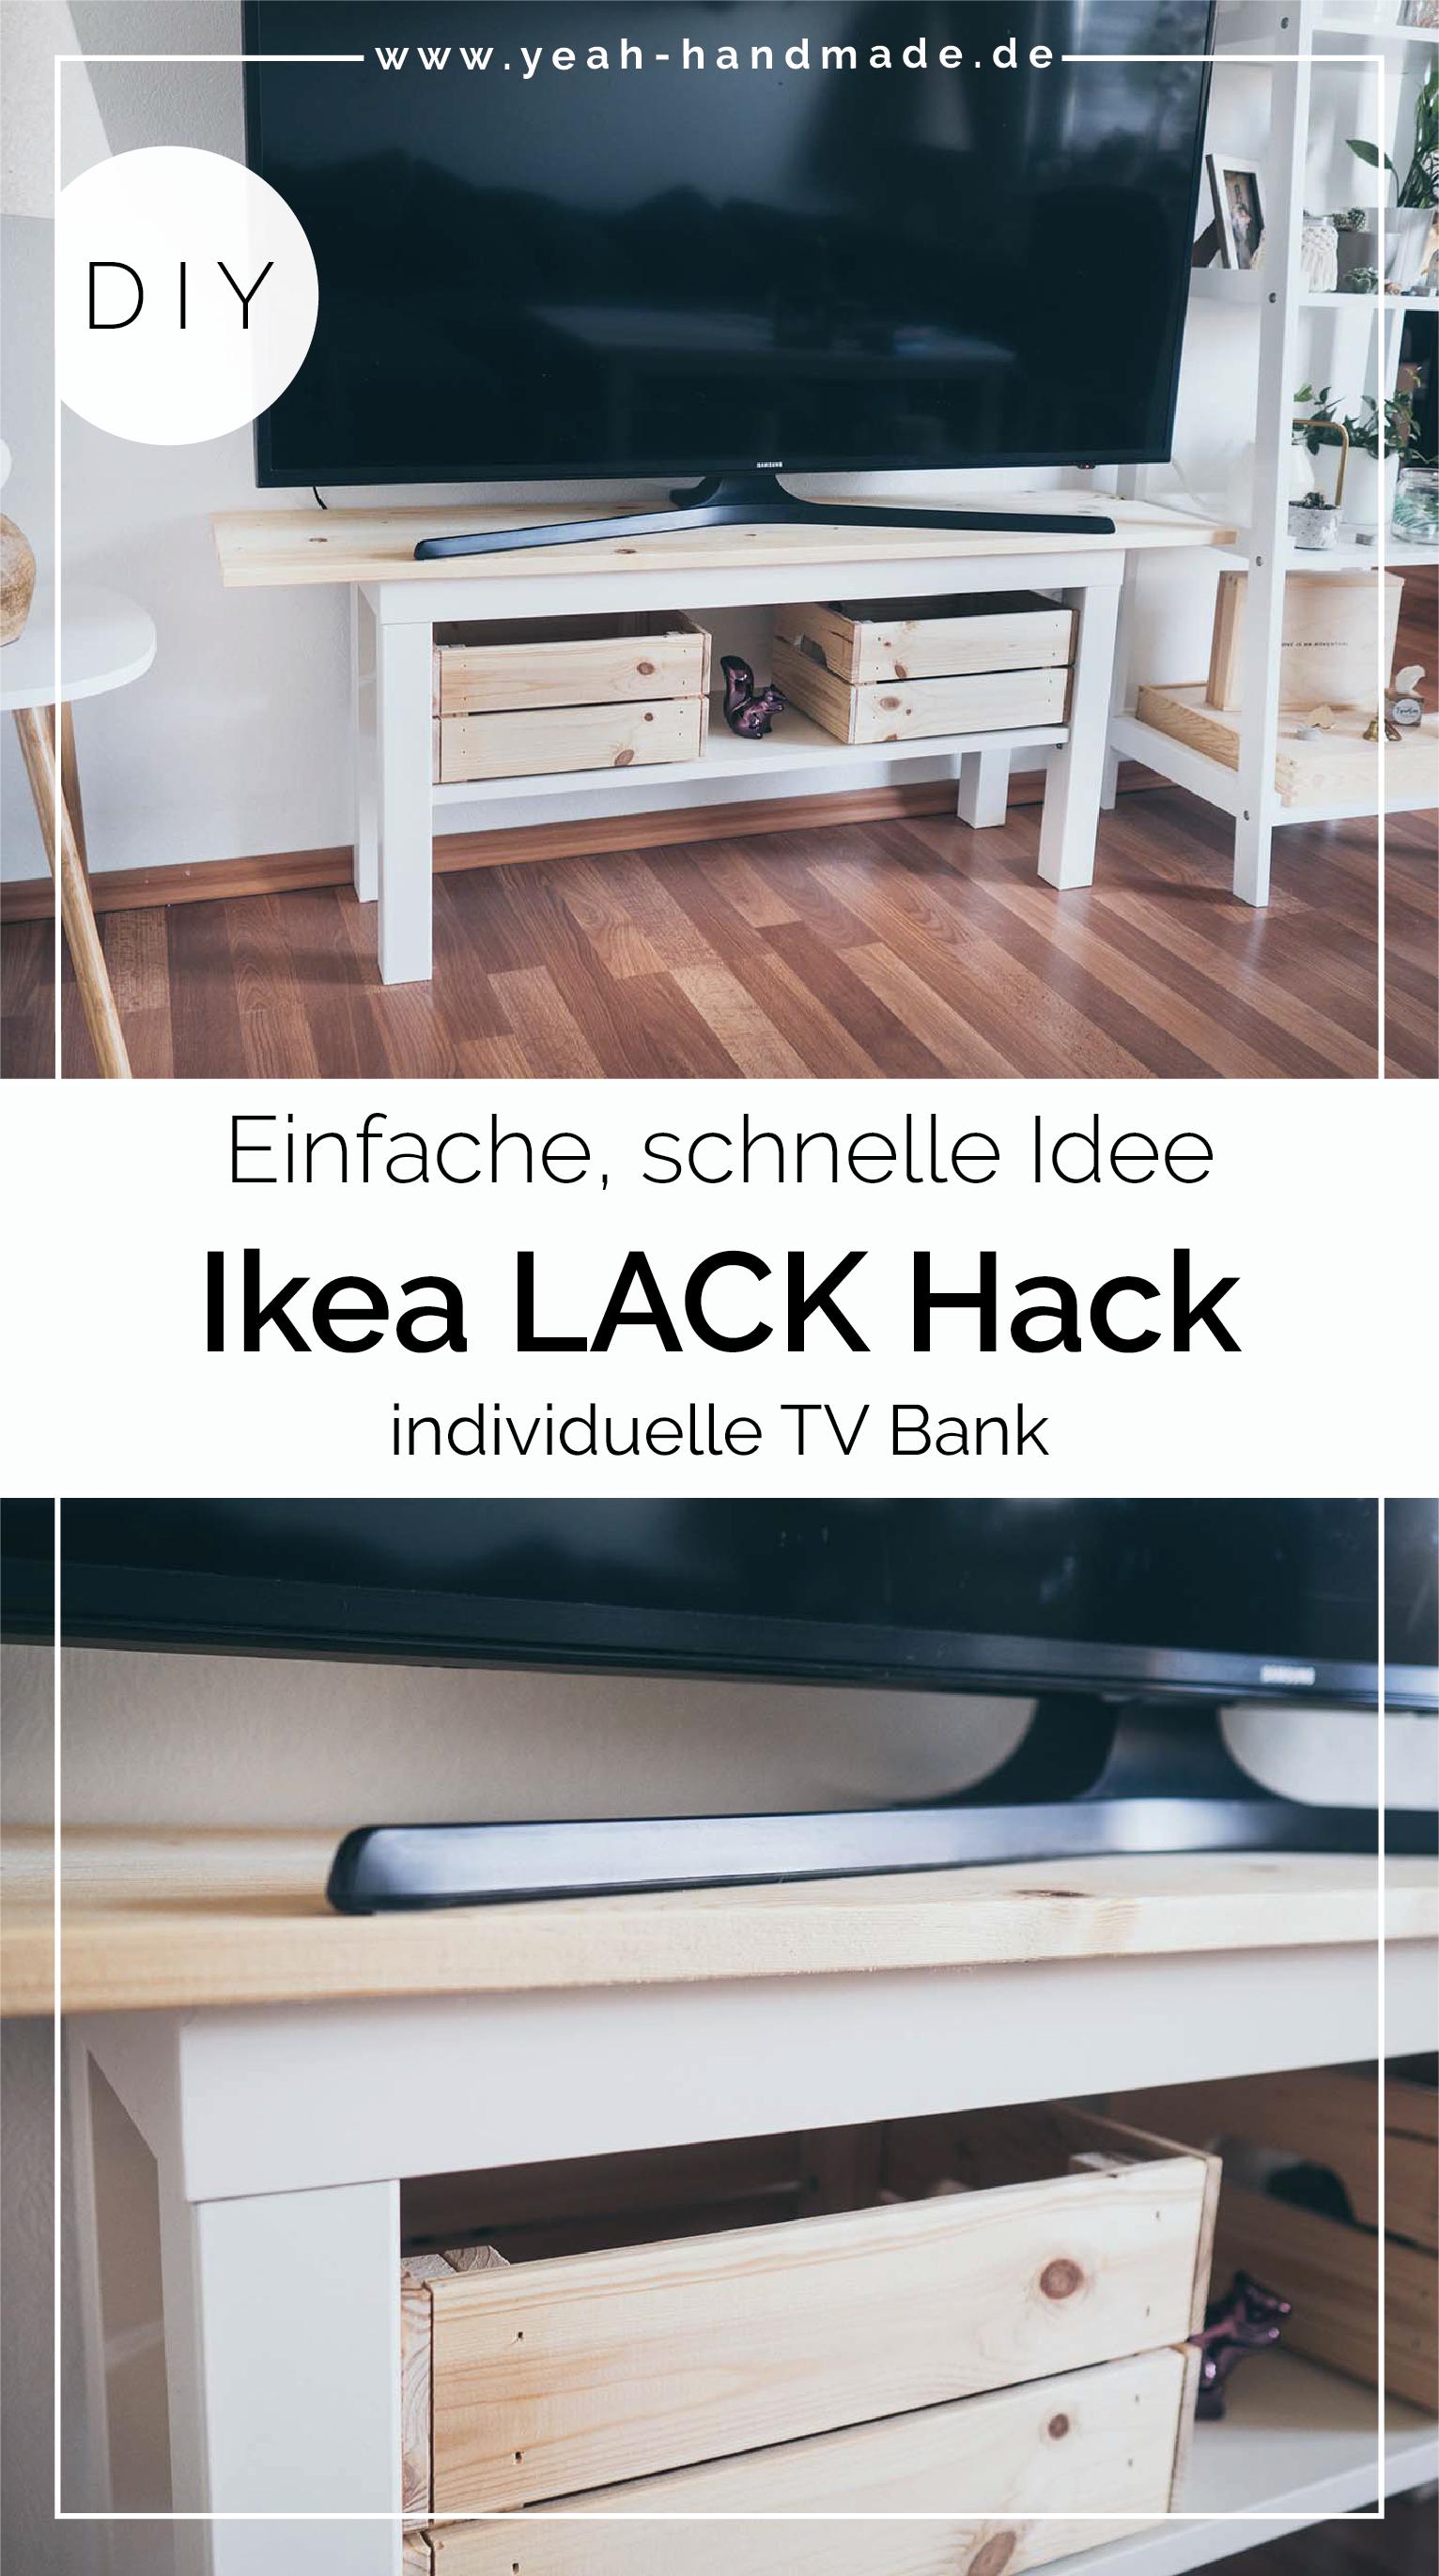 DIY Ikea LACK Hack TV Bank | Ikea diy, Ikea, Ikea mangel